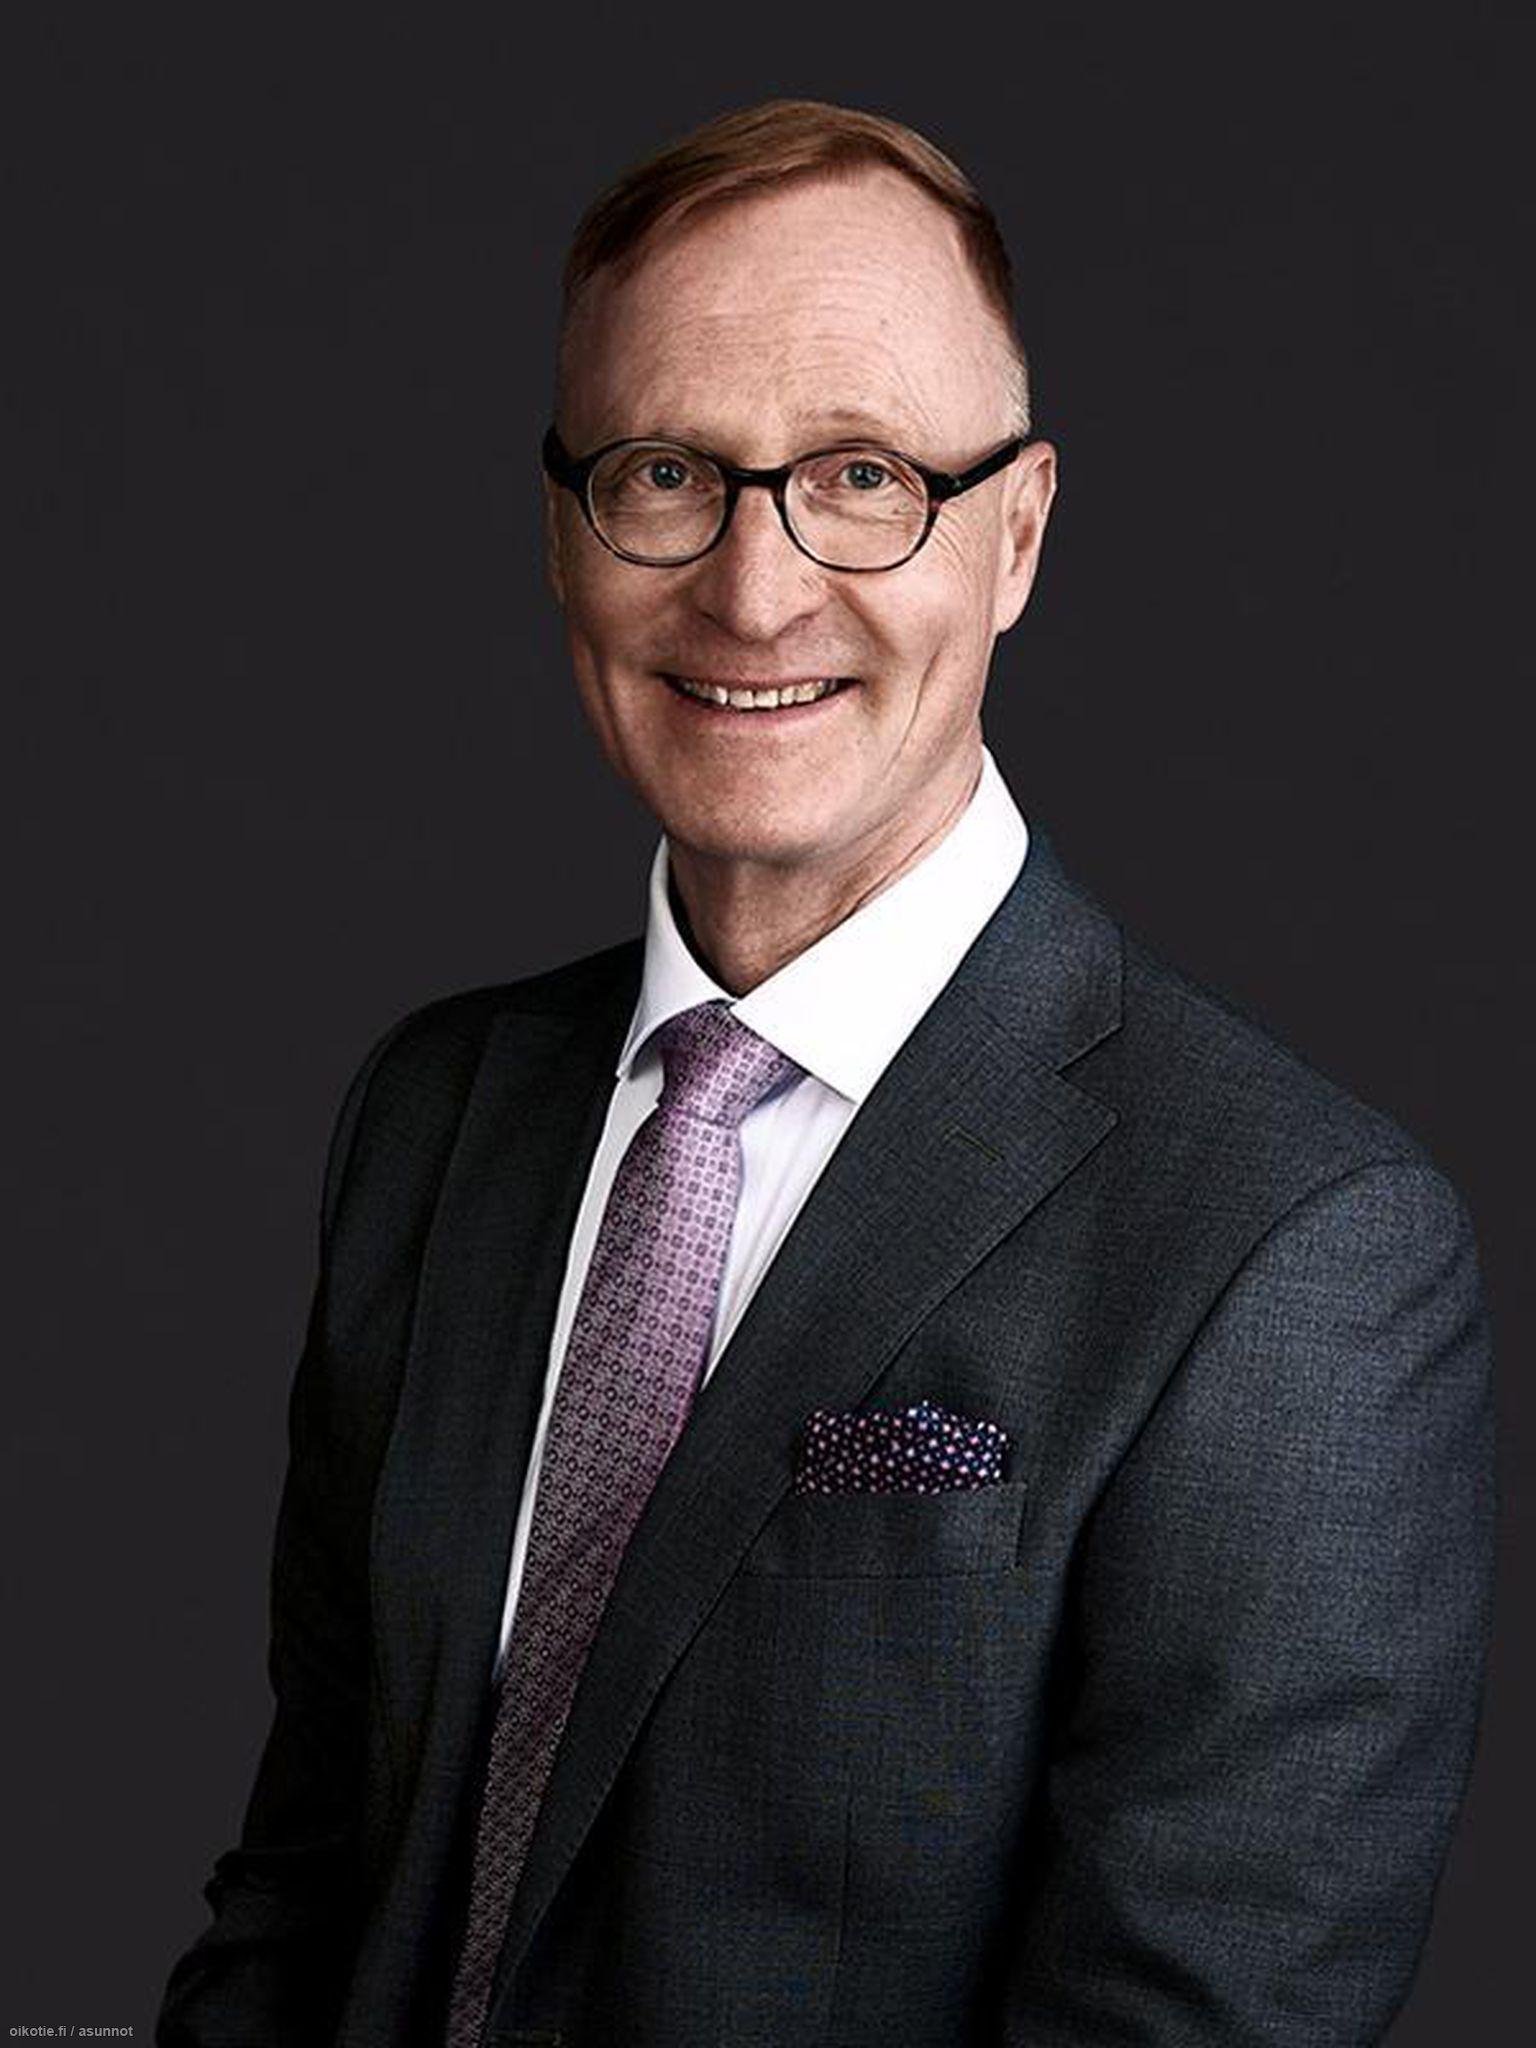 Timo Kanerva